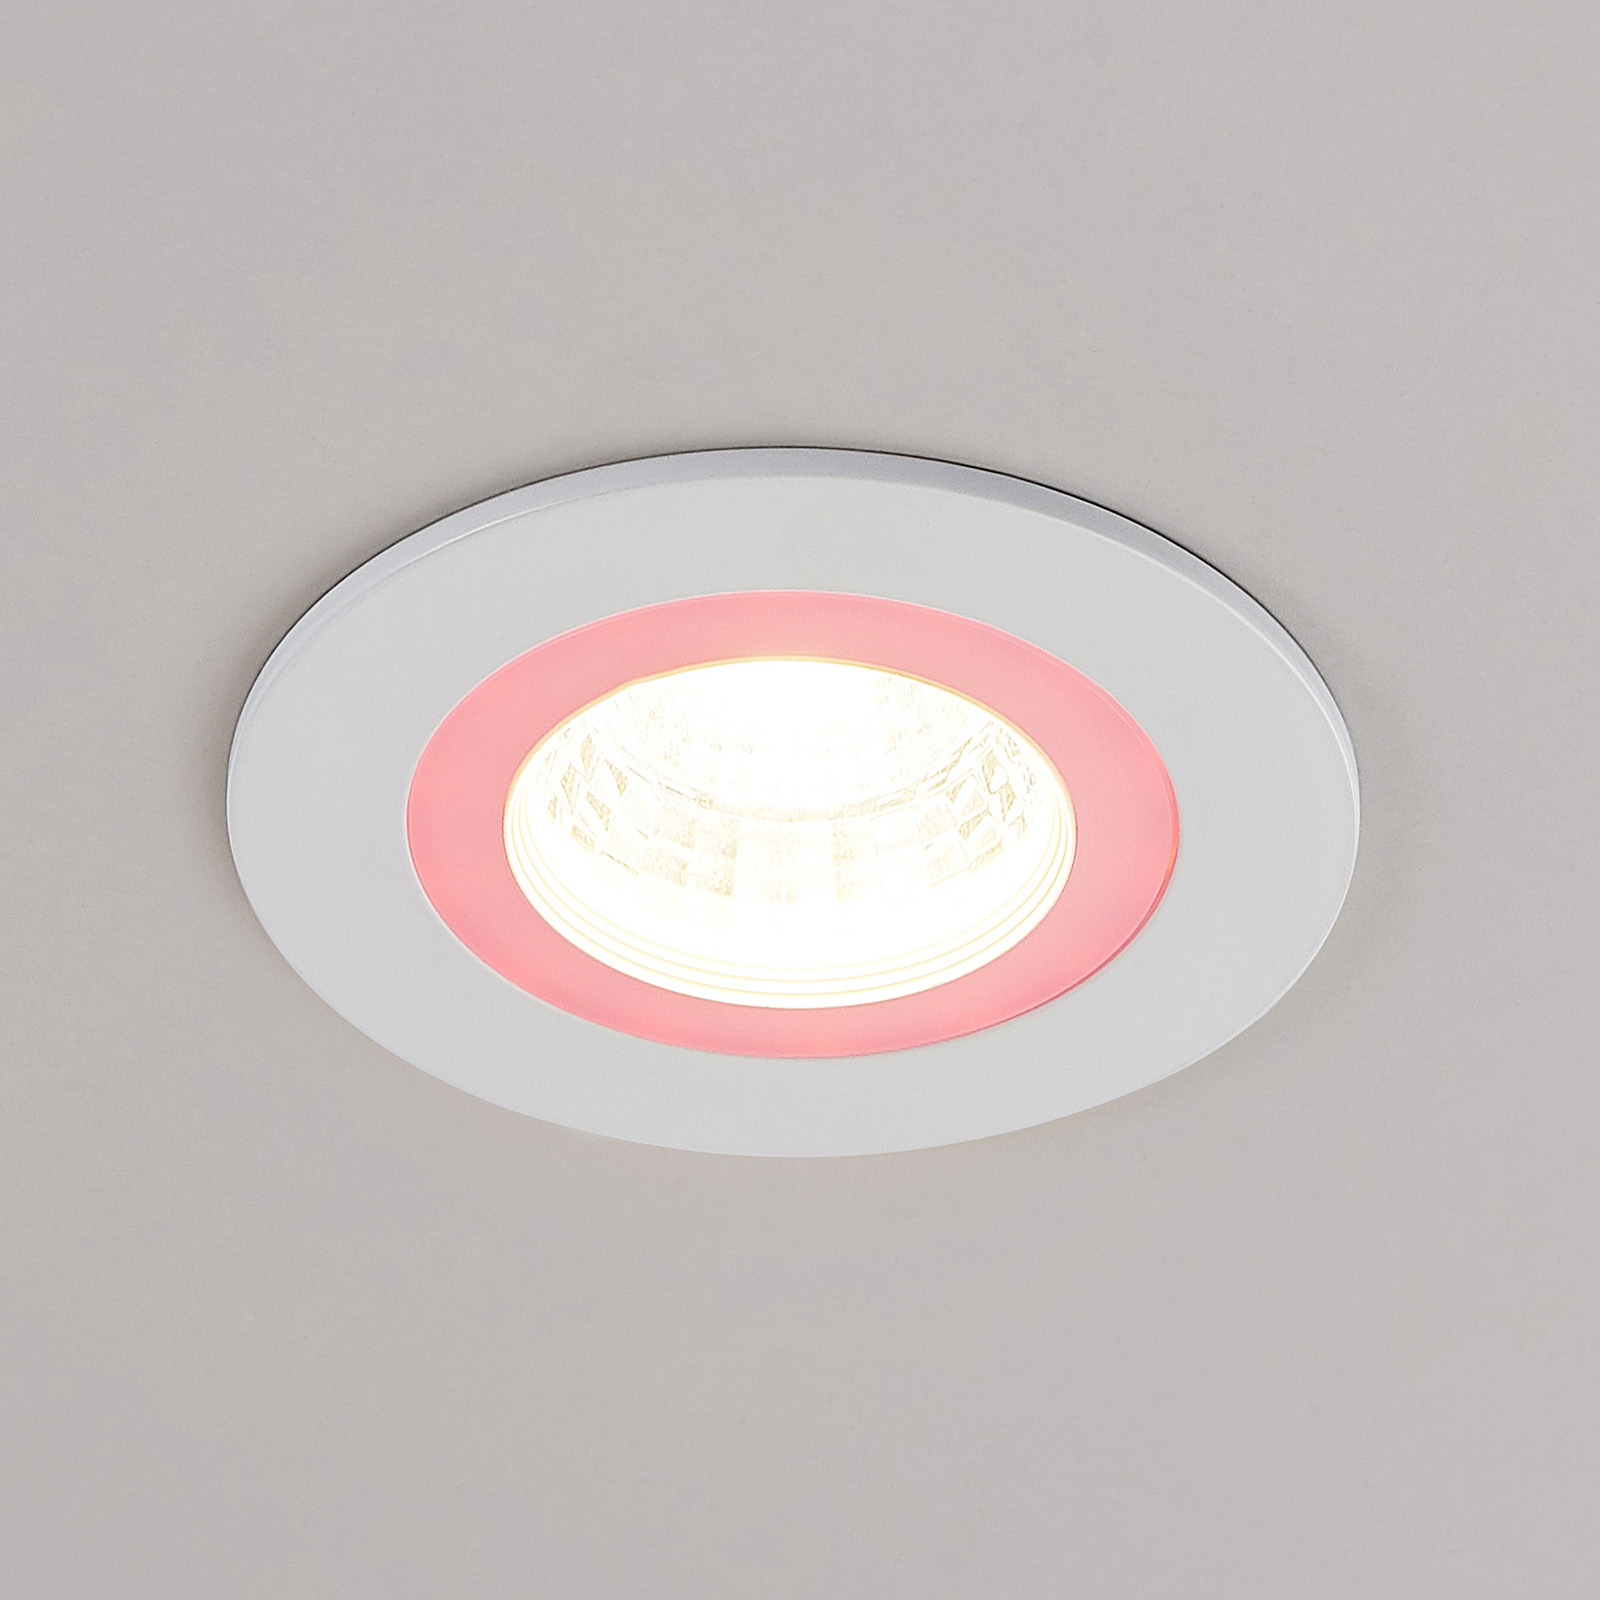 Lindby Noor LED-downlight RGBW, hvit